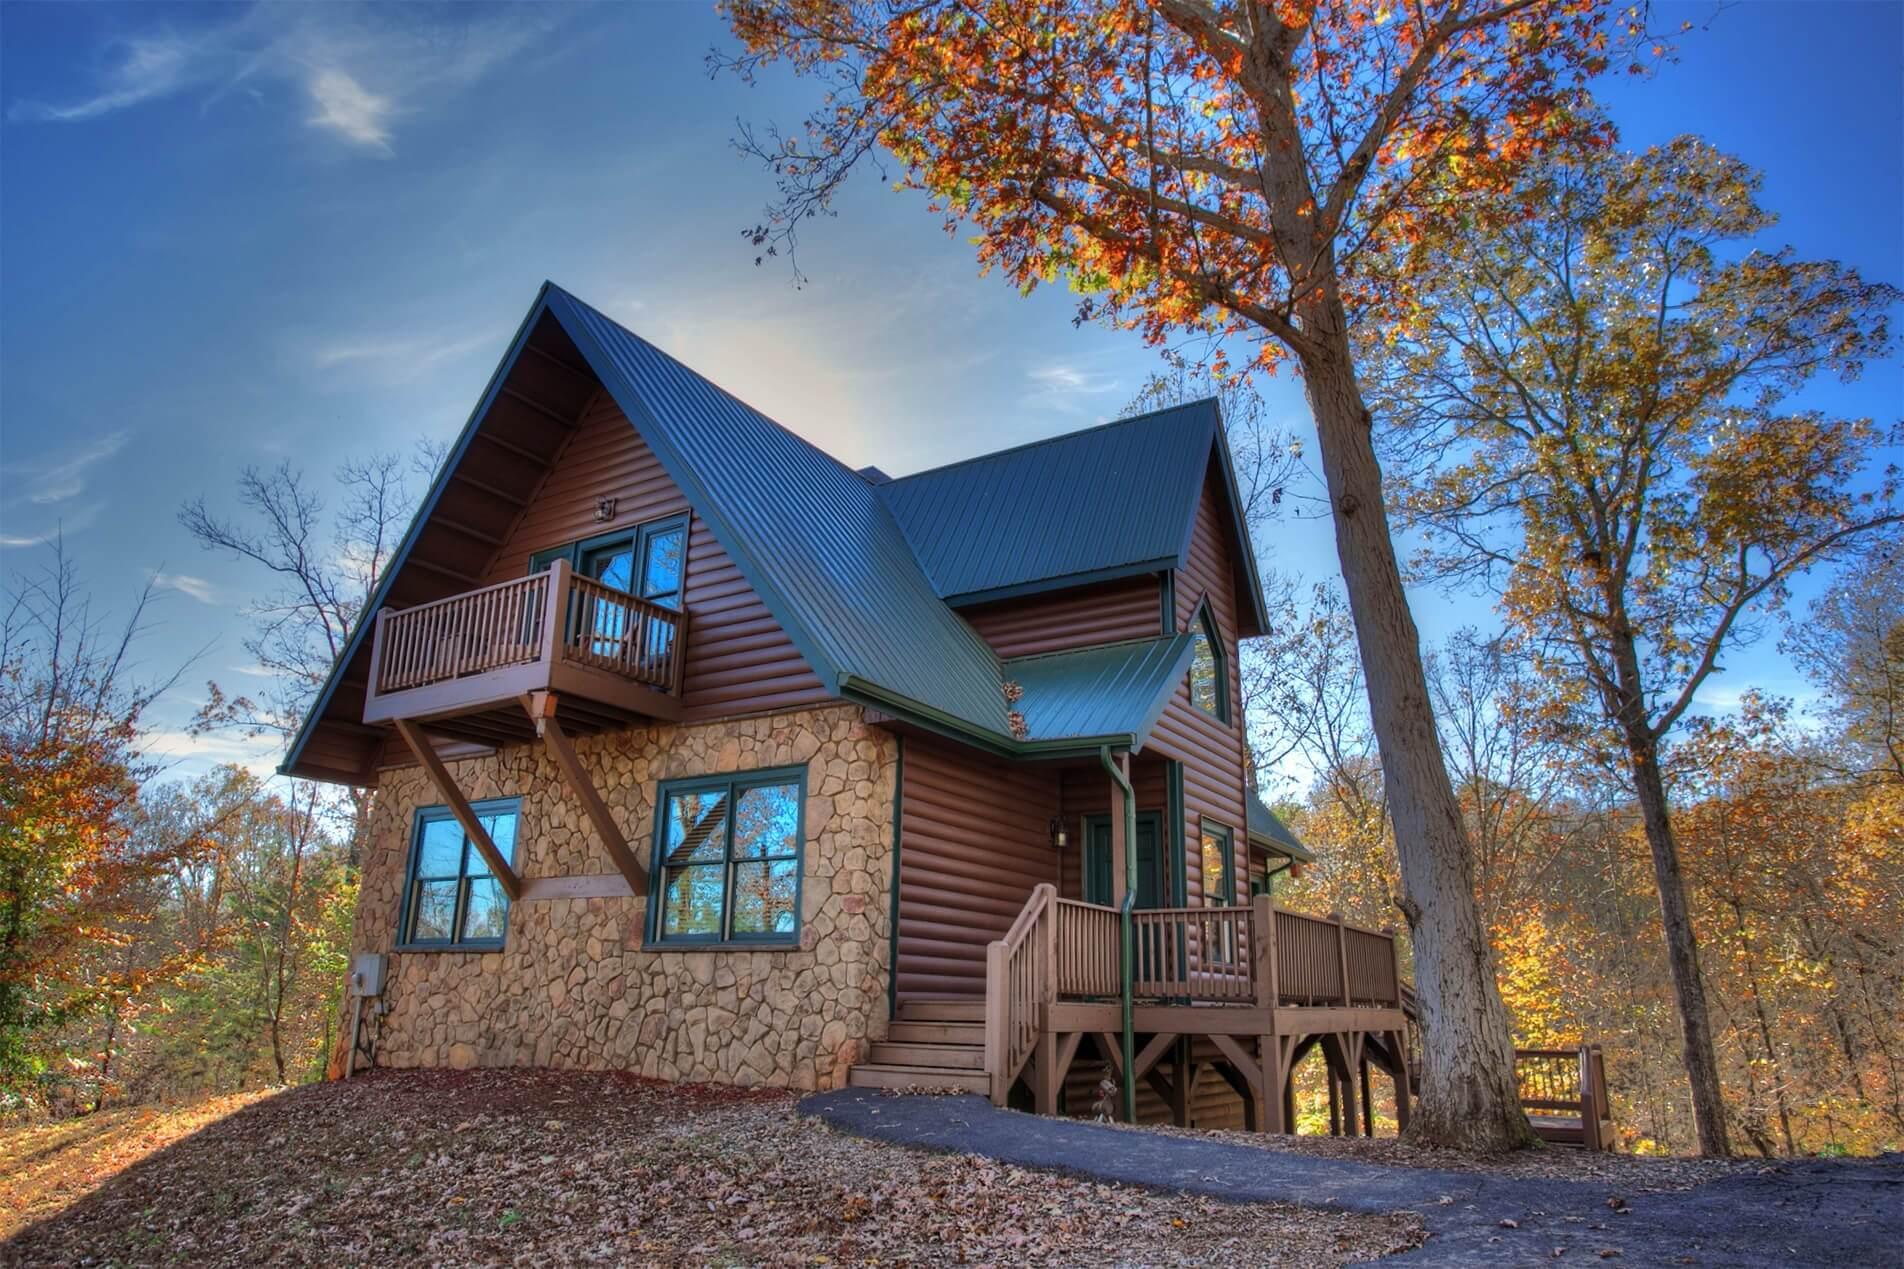 Oak-Hill-Cedar-Creek-Cabin-Rentals-Helen-Georgia-top-banner-tiny